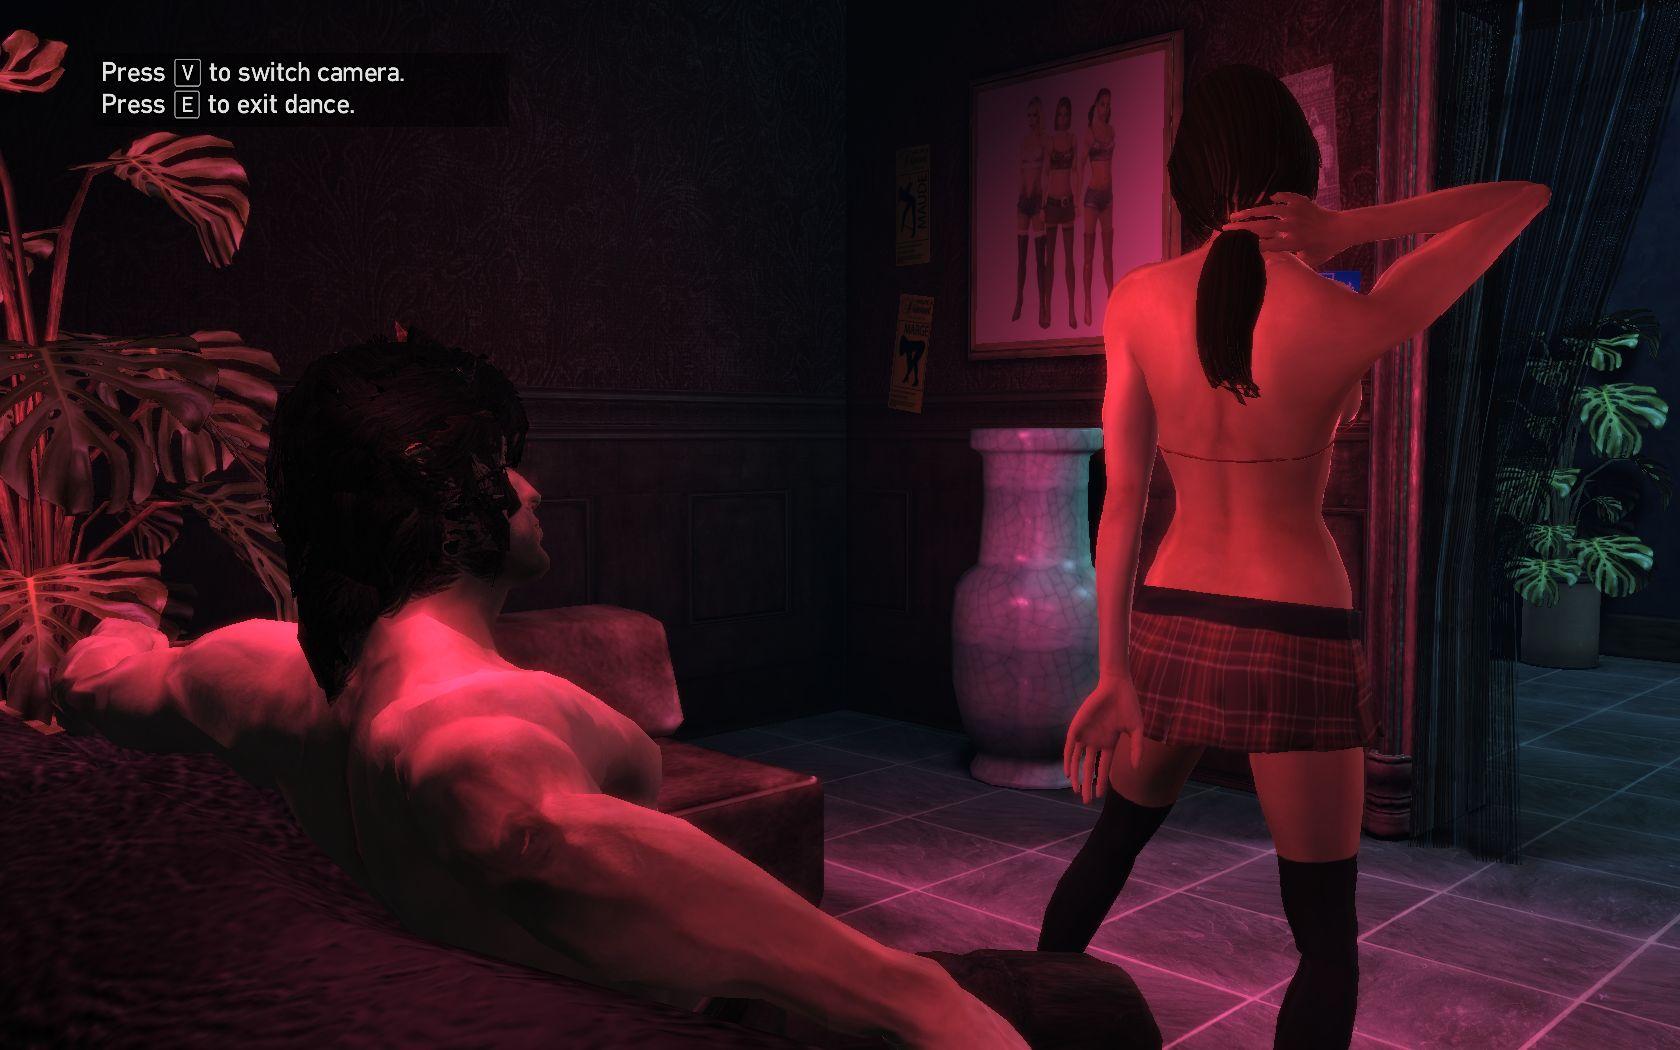 Gta 4 sex mods